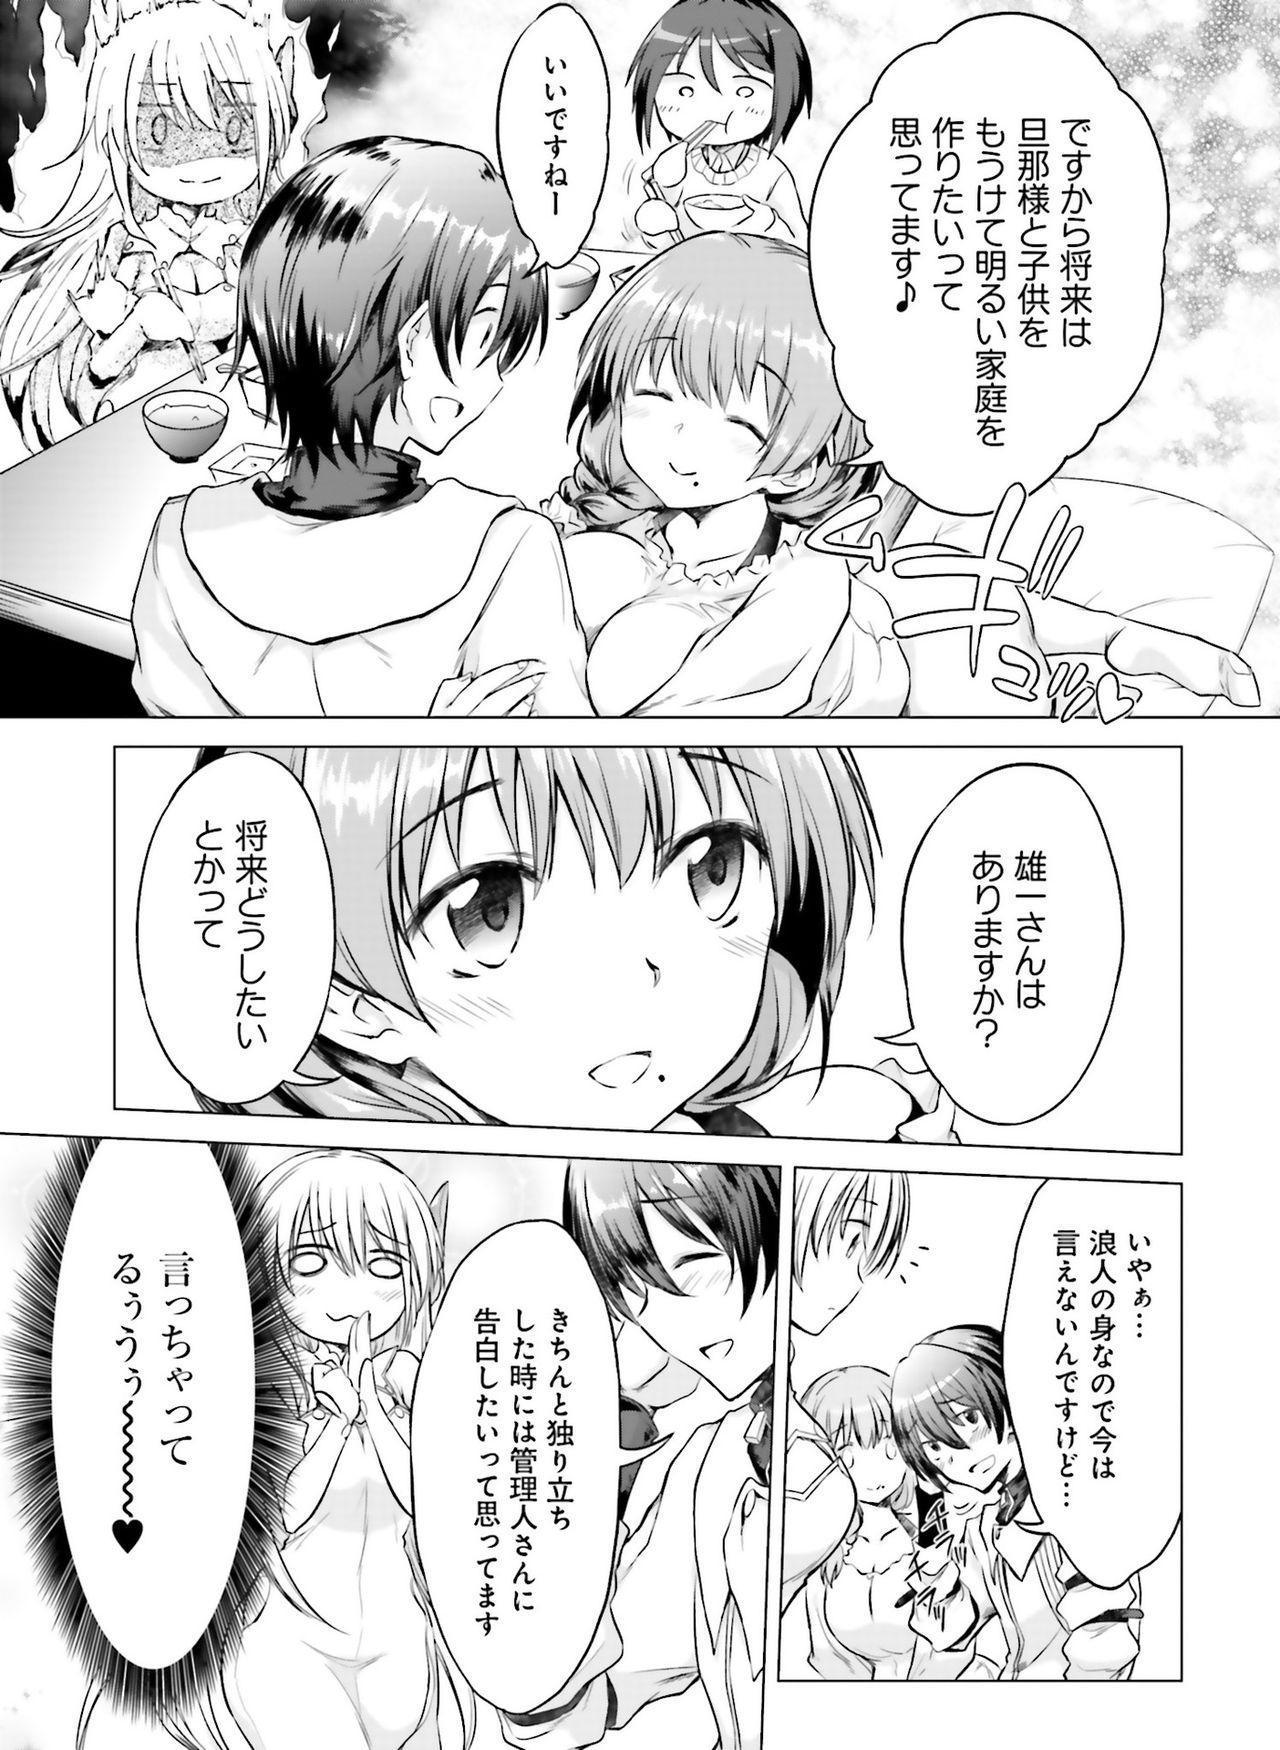 Dengeki Moeoh 2019-04 143